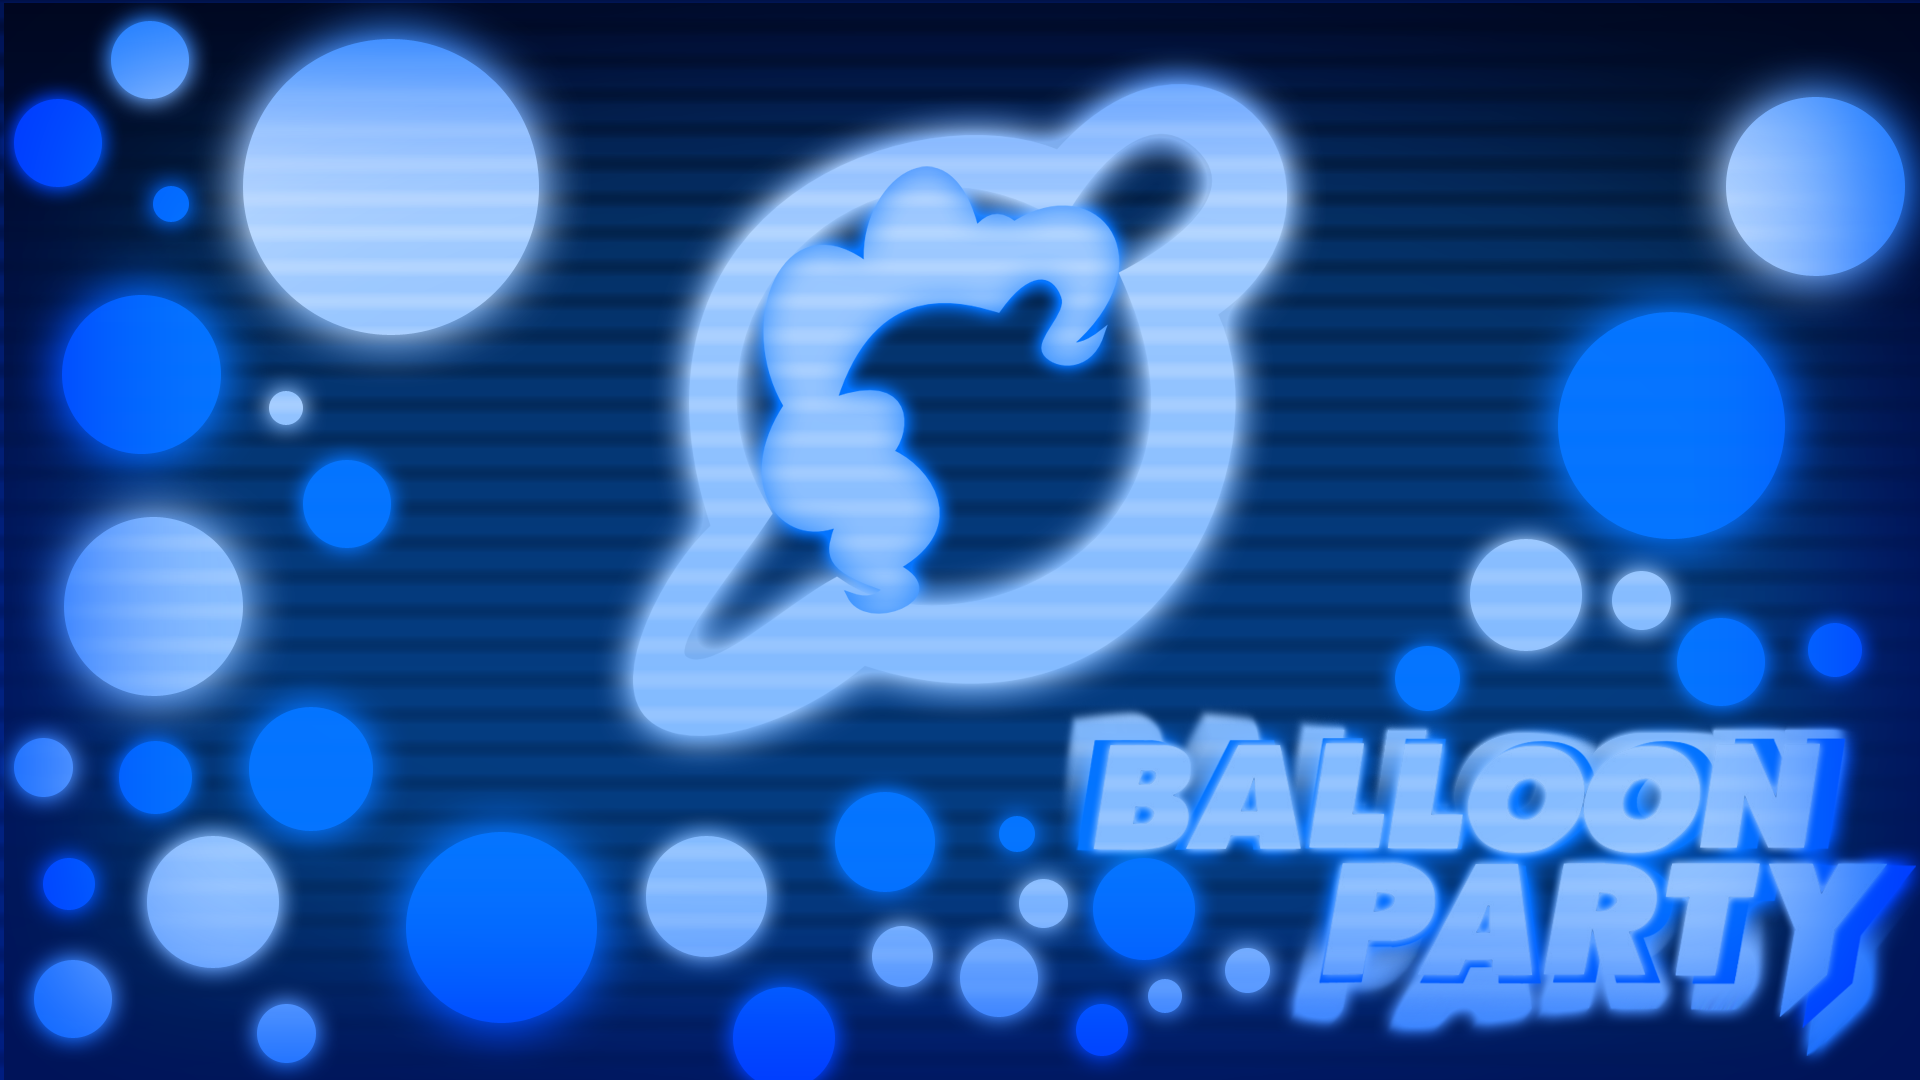 Balloon Party Speckles by KibbieTheGreat